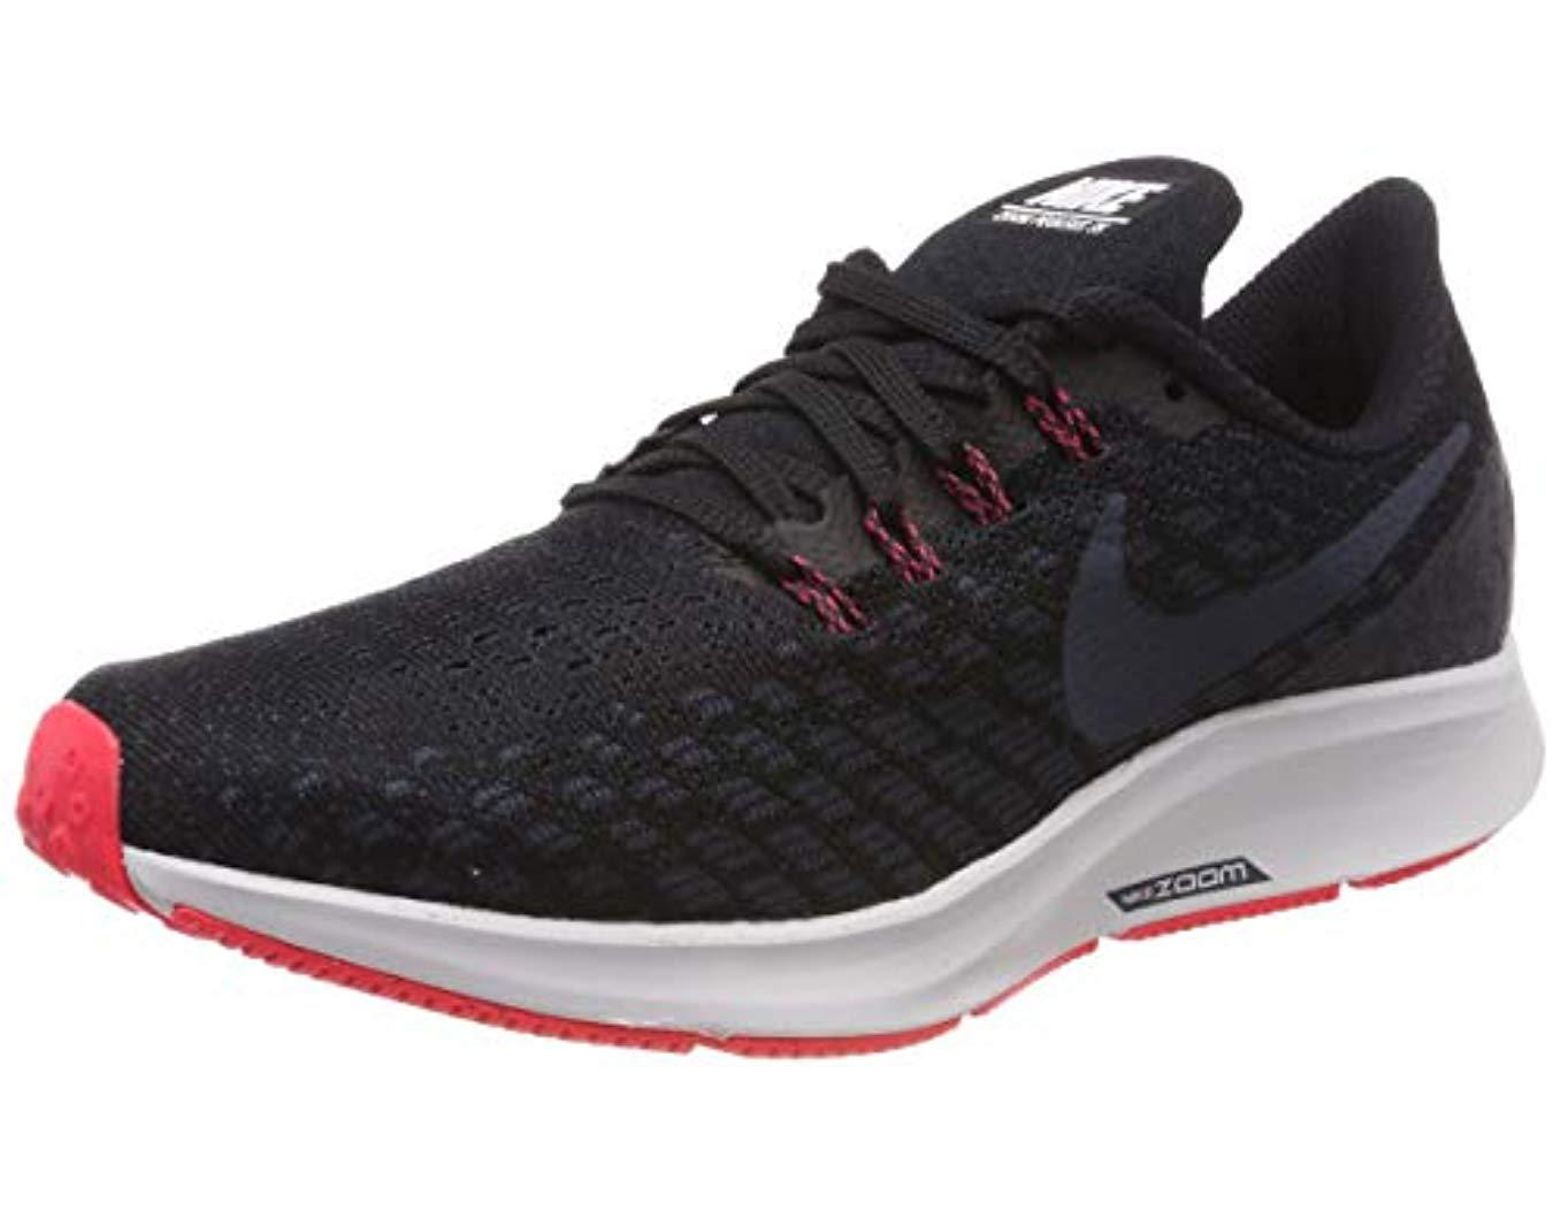 032e0f6d746d2 Men's Black Air Zoom Pegasus 35 Running Shoes